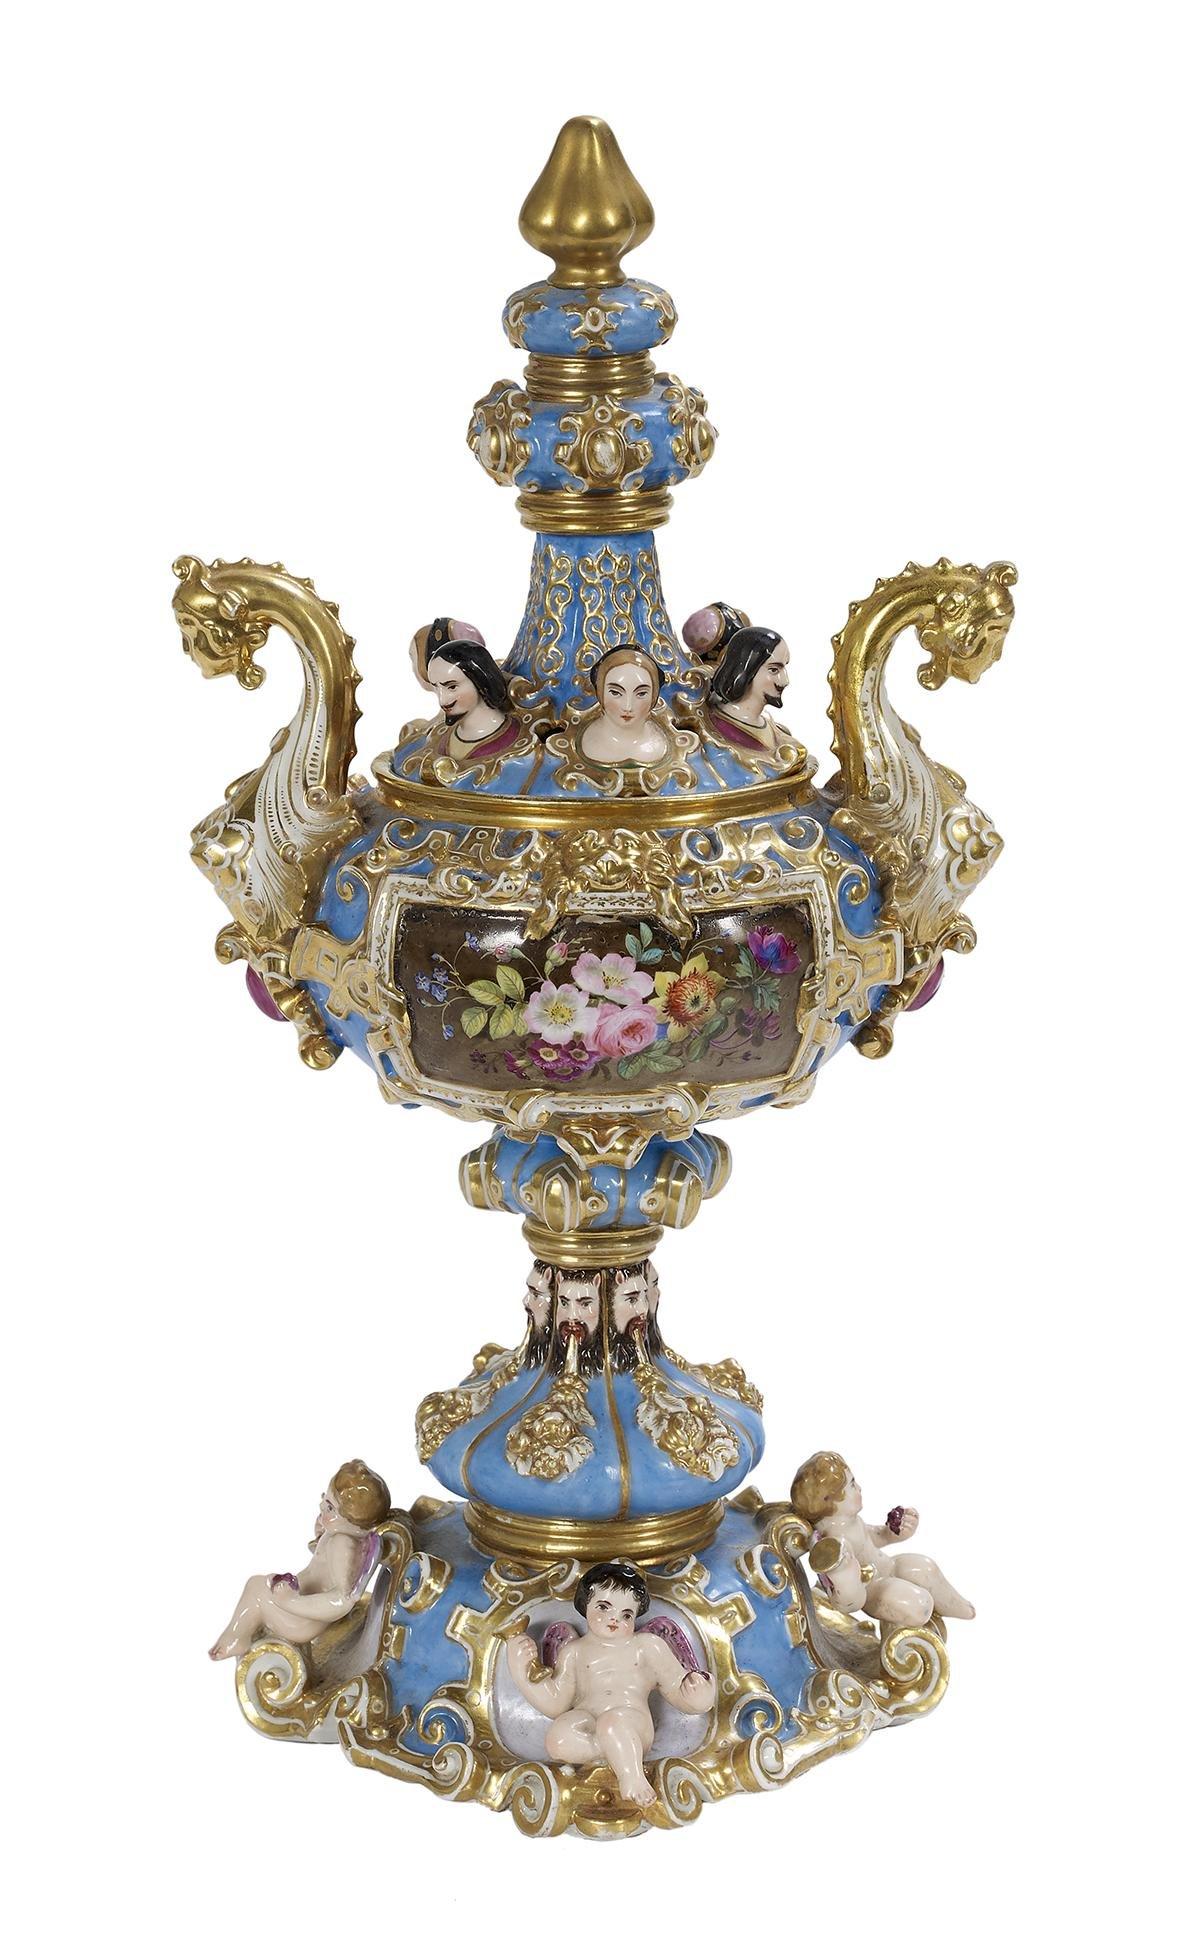 Jacob Petit Paris Porcelain Covered Potpourri Urn